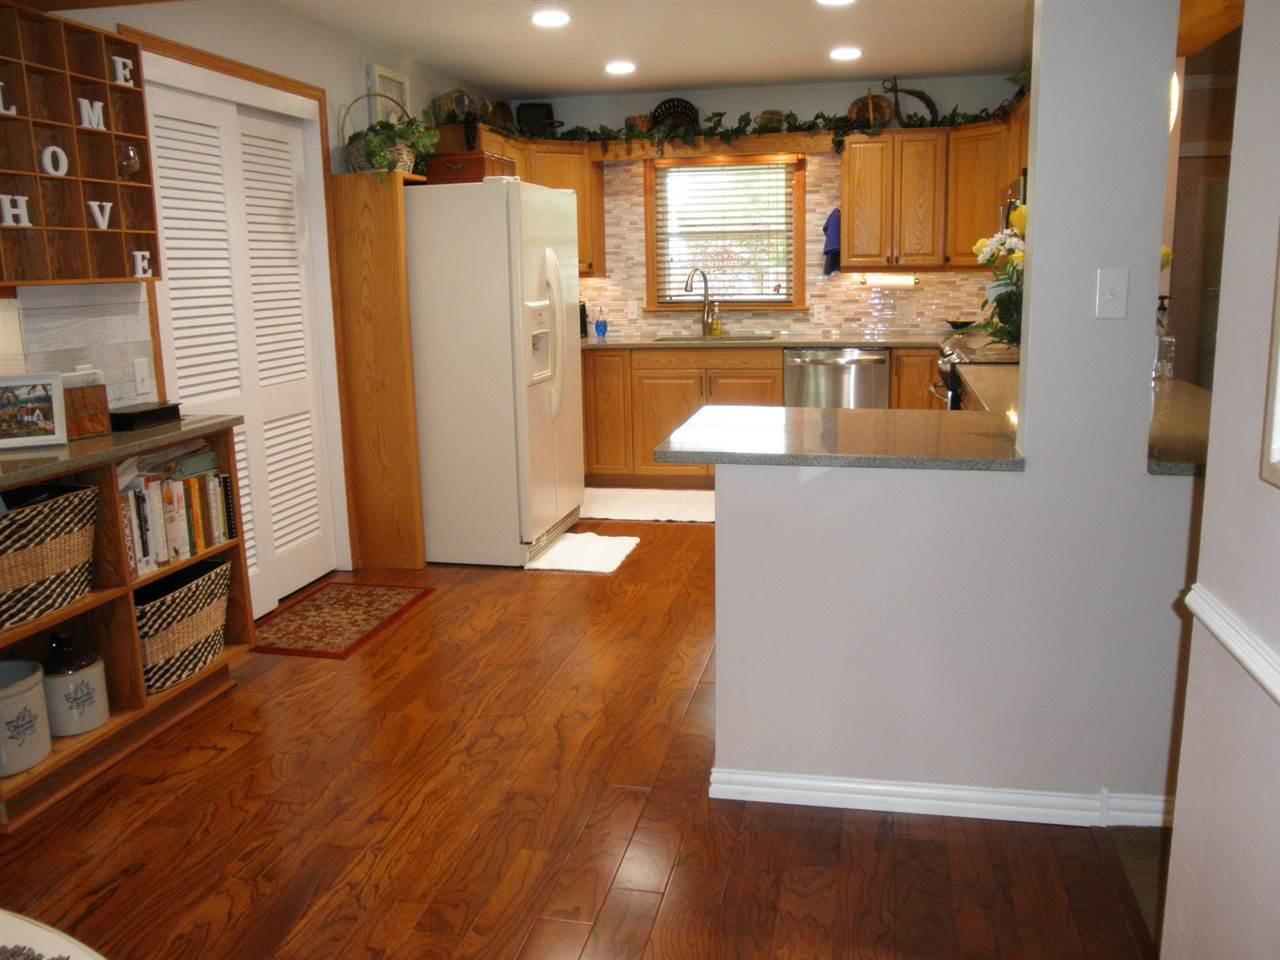 Sold Cross Sale W/ MLS | 127 Fairview  Ponca City, OK 74601 13